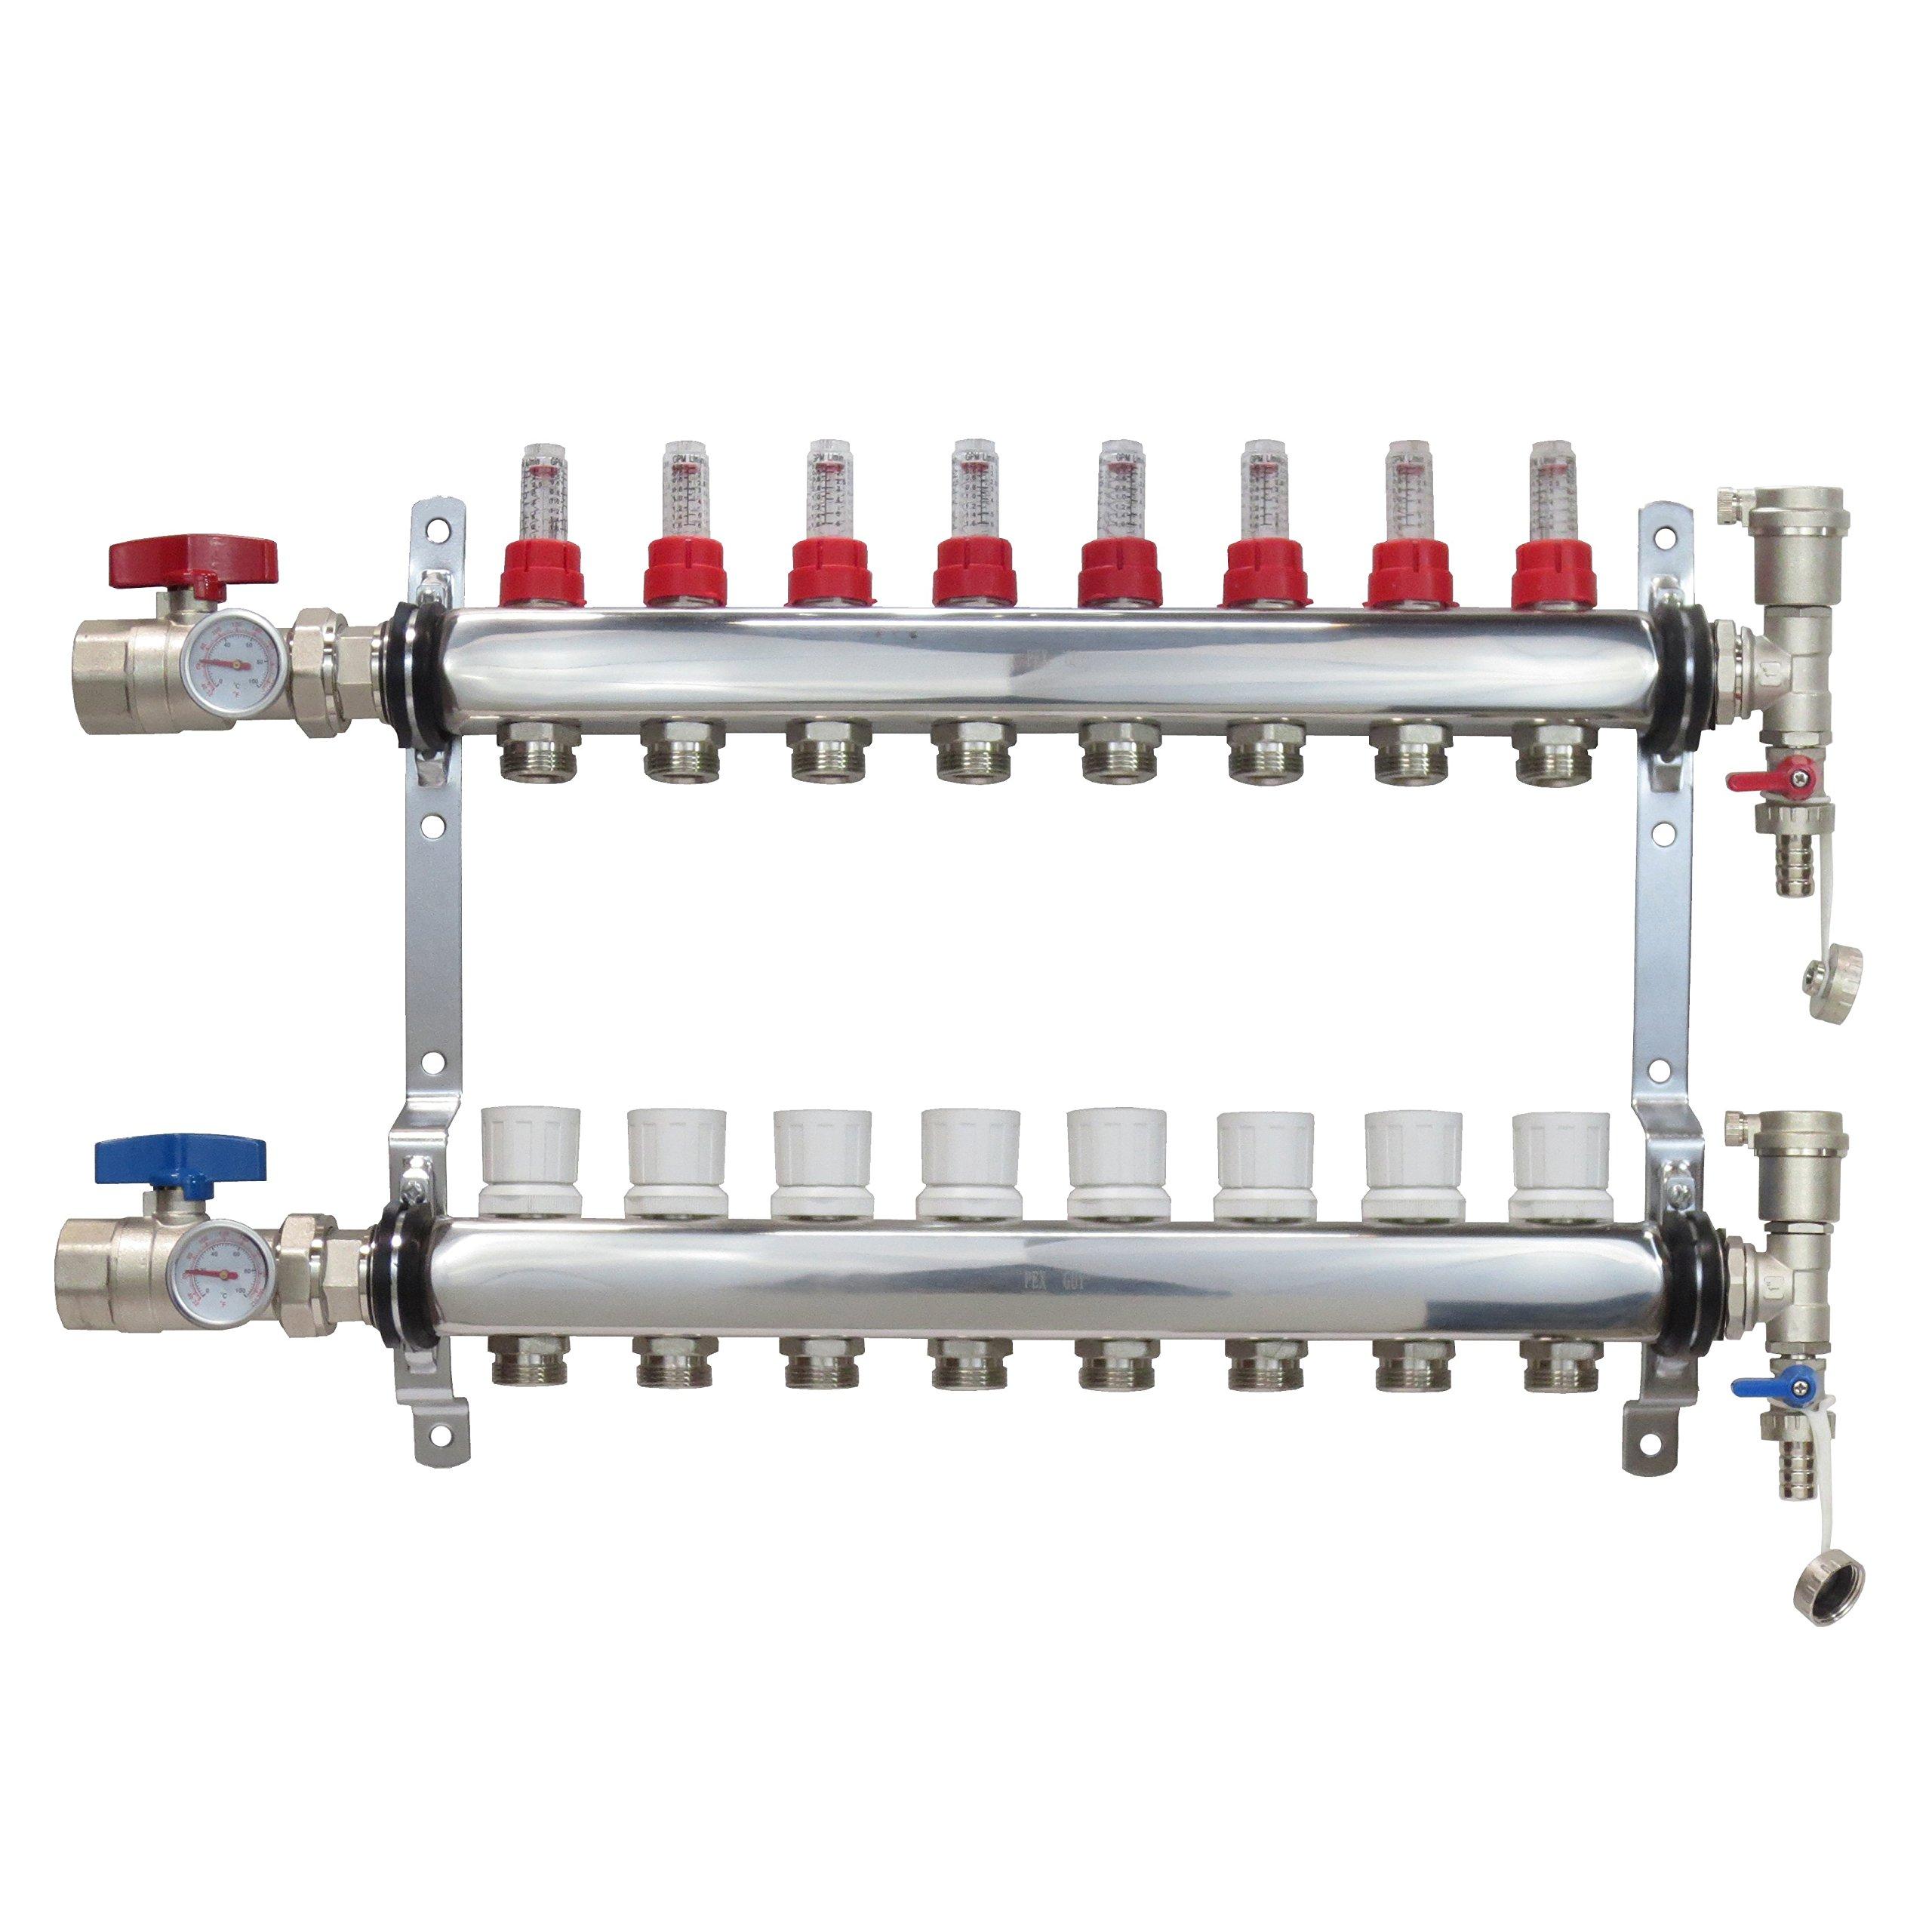 8 Loop Stainless Steel Premium PEX Manifold With 1/2'' Connectors for Radiant Heating - PEX GUY (8 Loops)